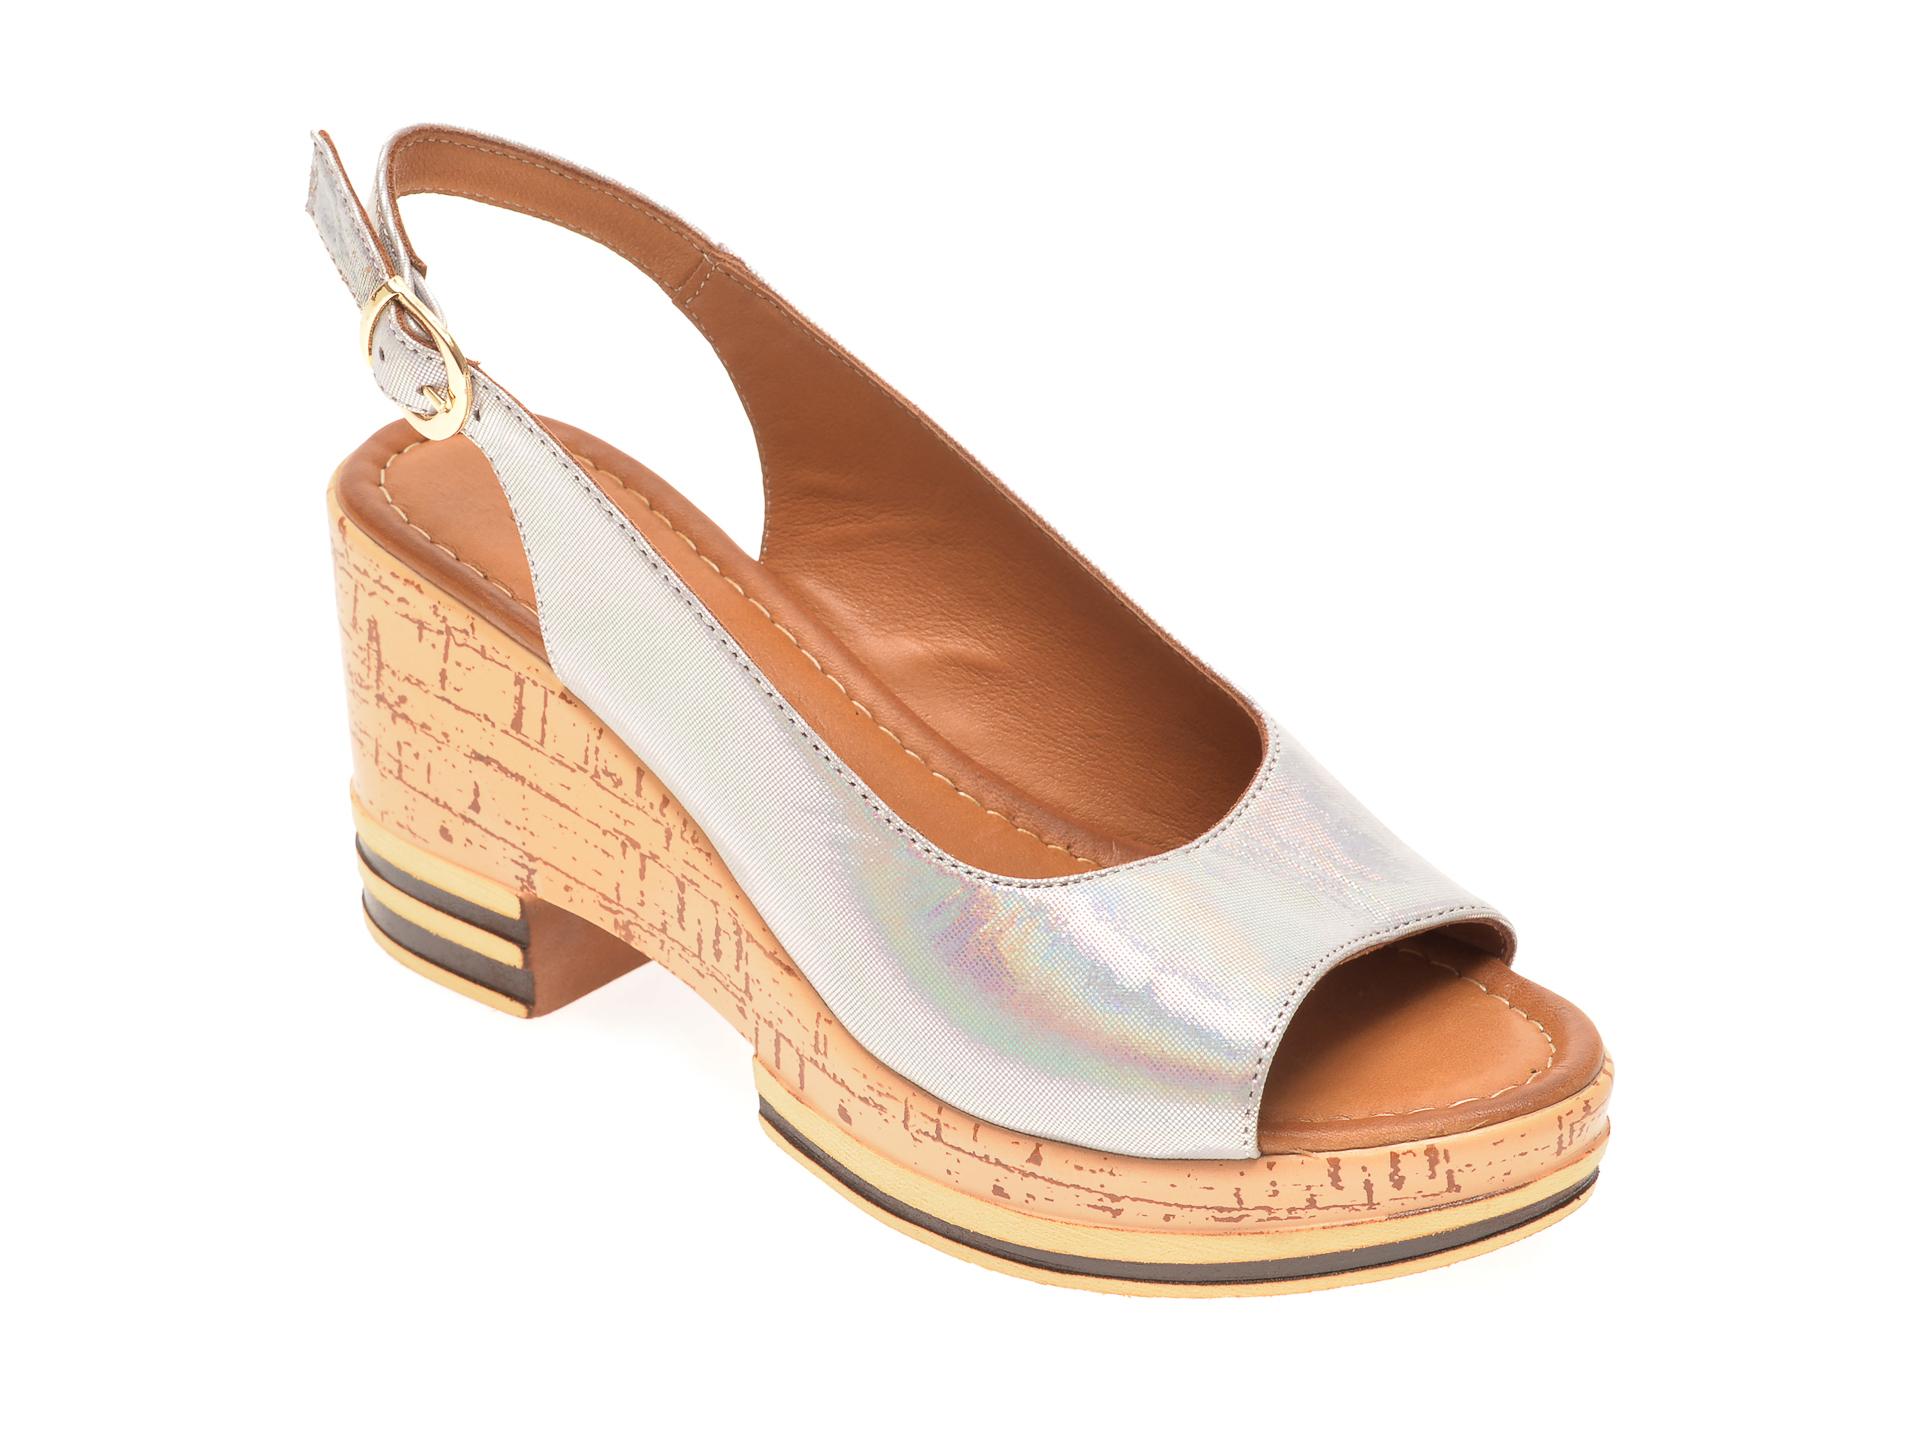 Sandale FLAVIA PASSINI argintii, 1182724, din piele naturala New